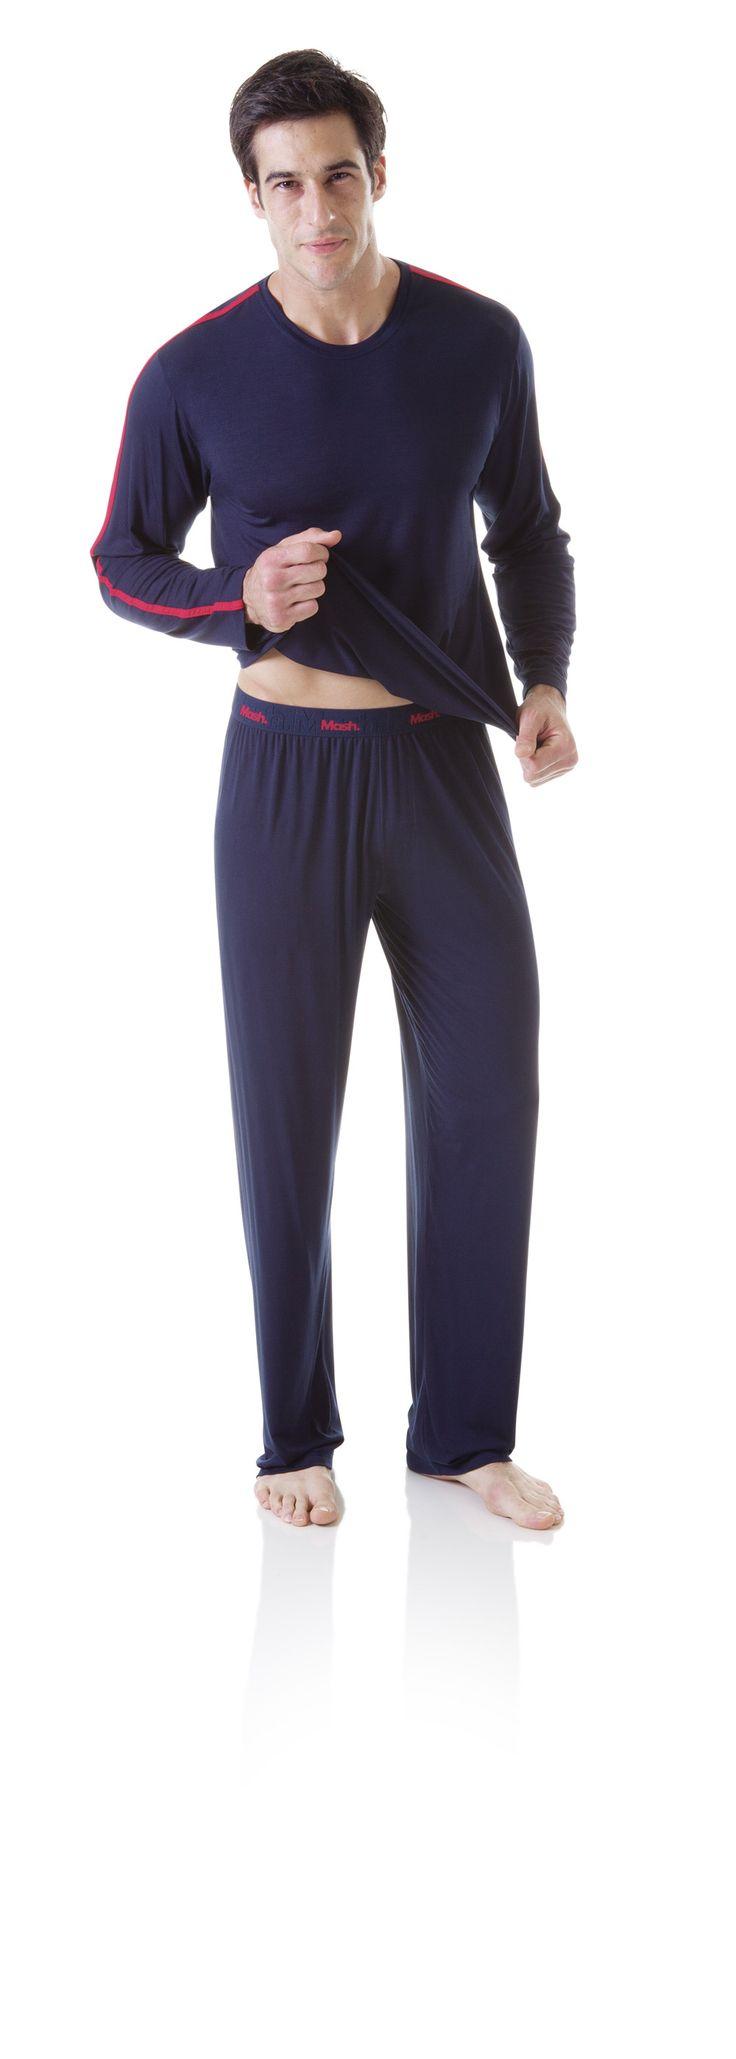 Pijama Masculino #produtos #uniclingerie  #mash #masculino #man #pijama #sleep #homem #frio #inverno #winter #cold